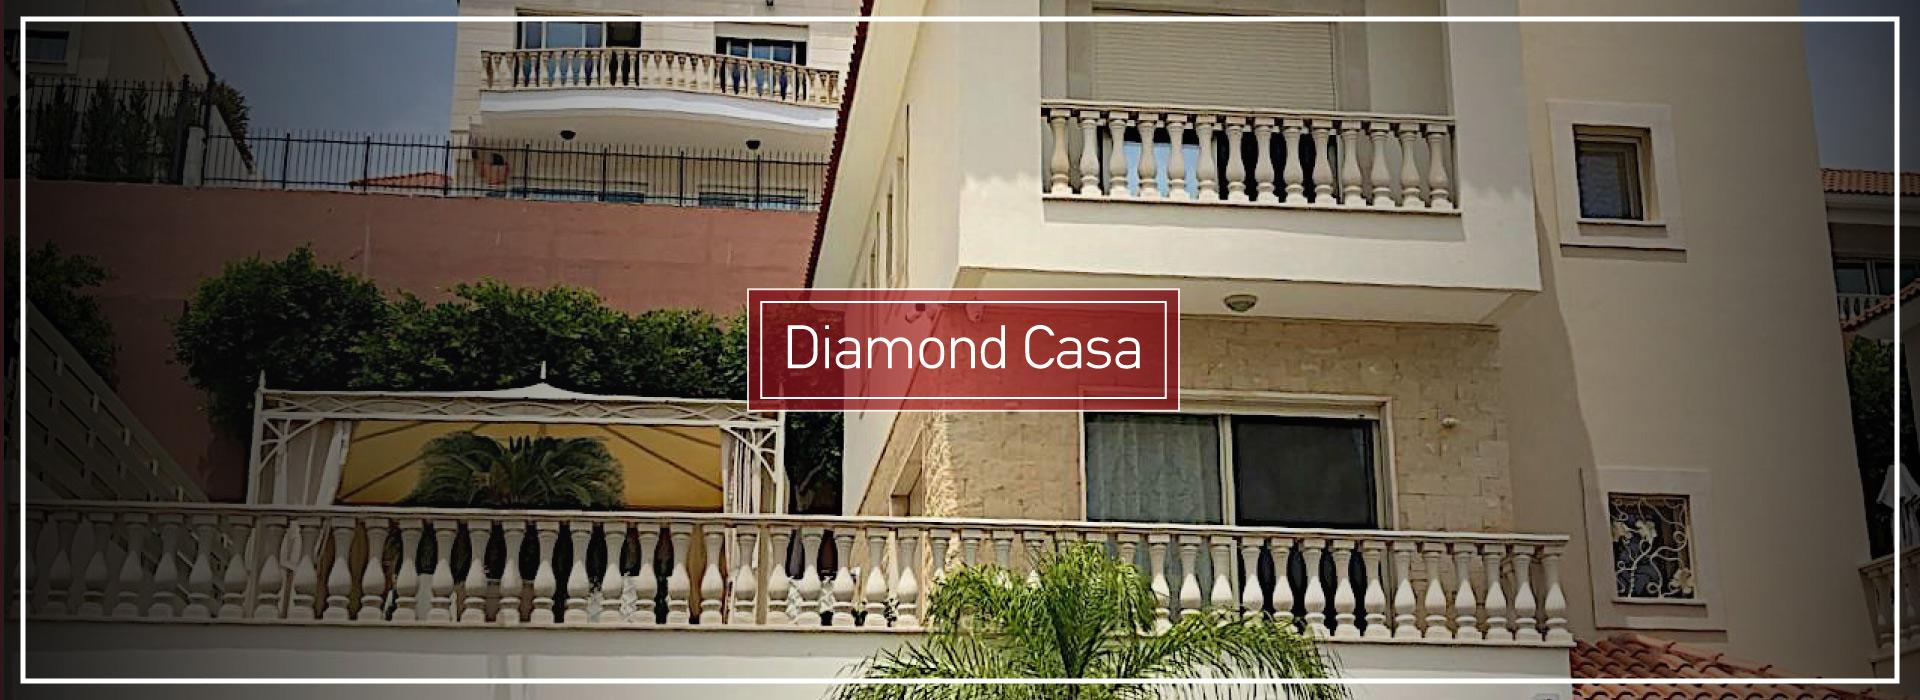 DIAMOND CASA RESALE